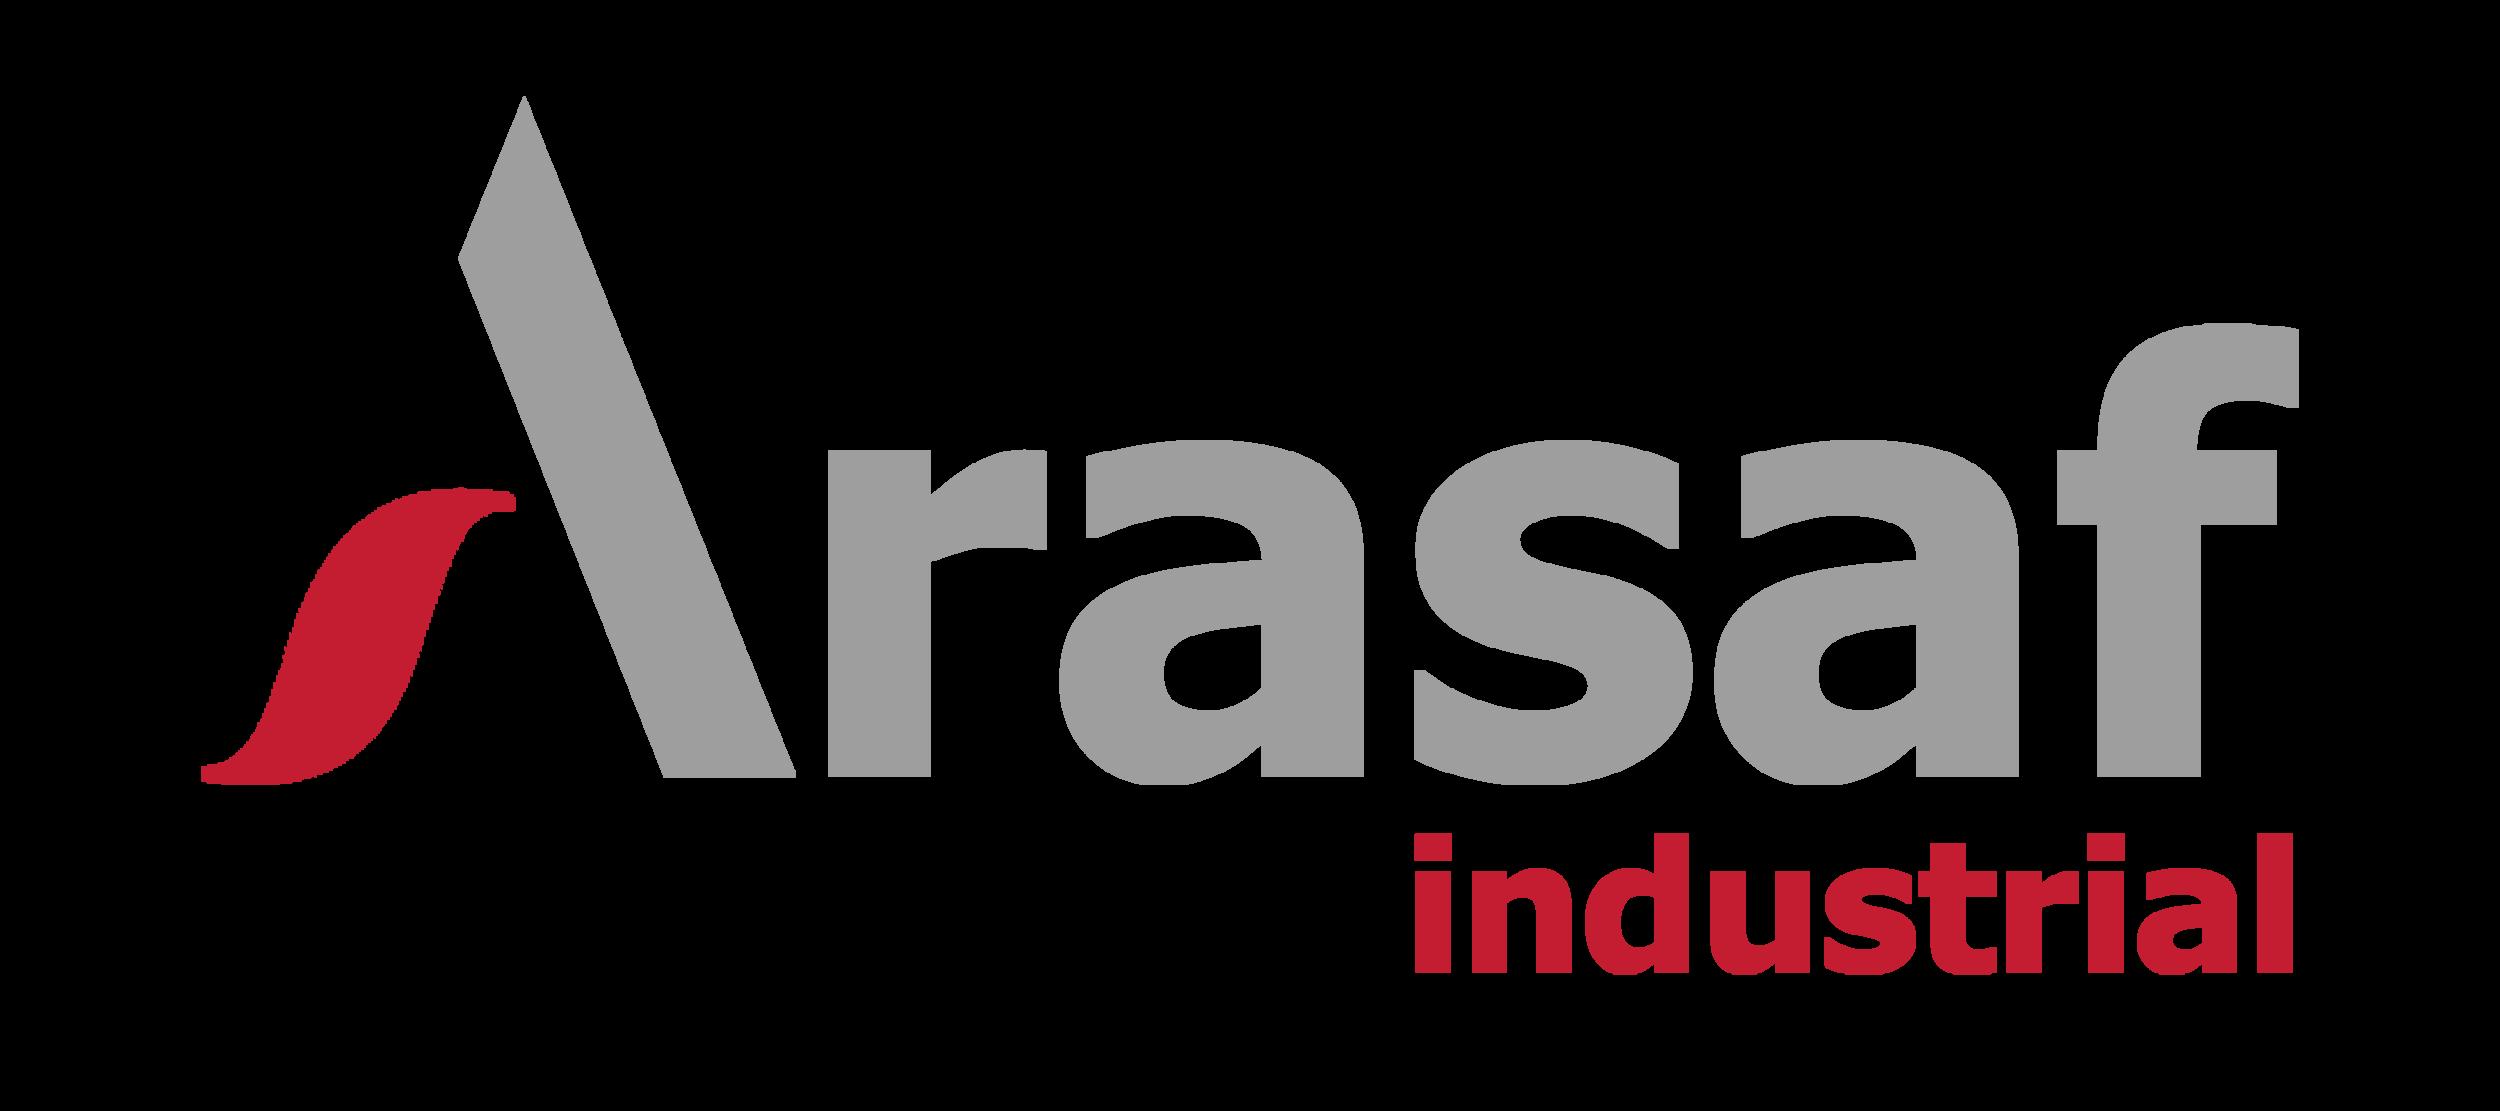 ARASAF_industrial_original.png